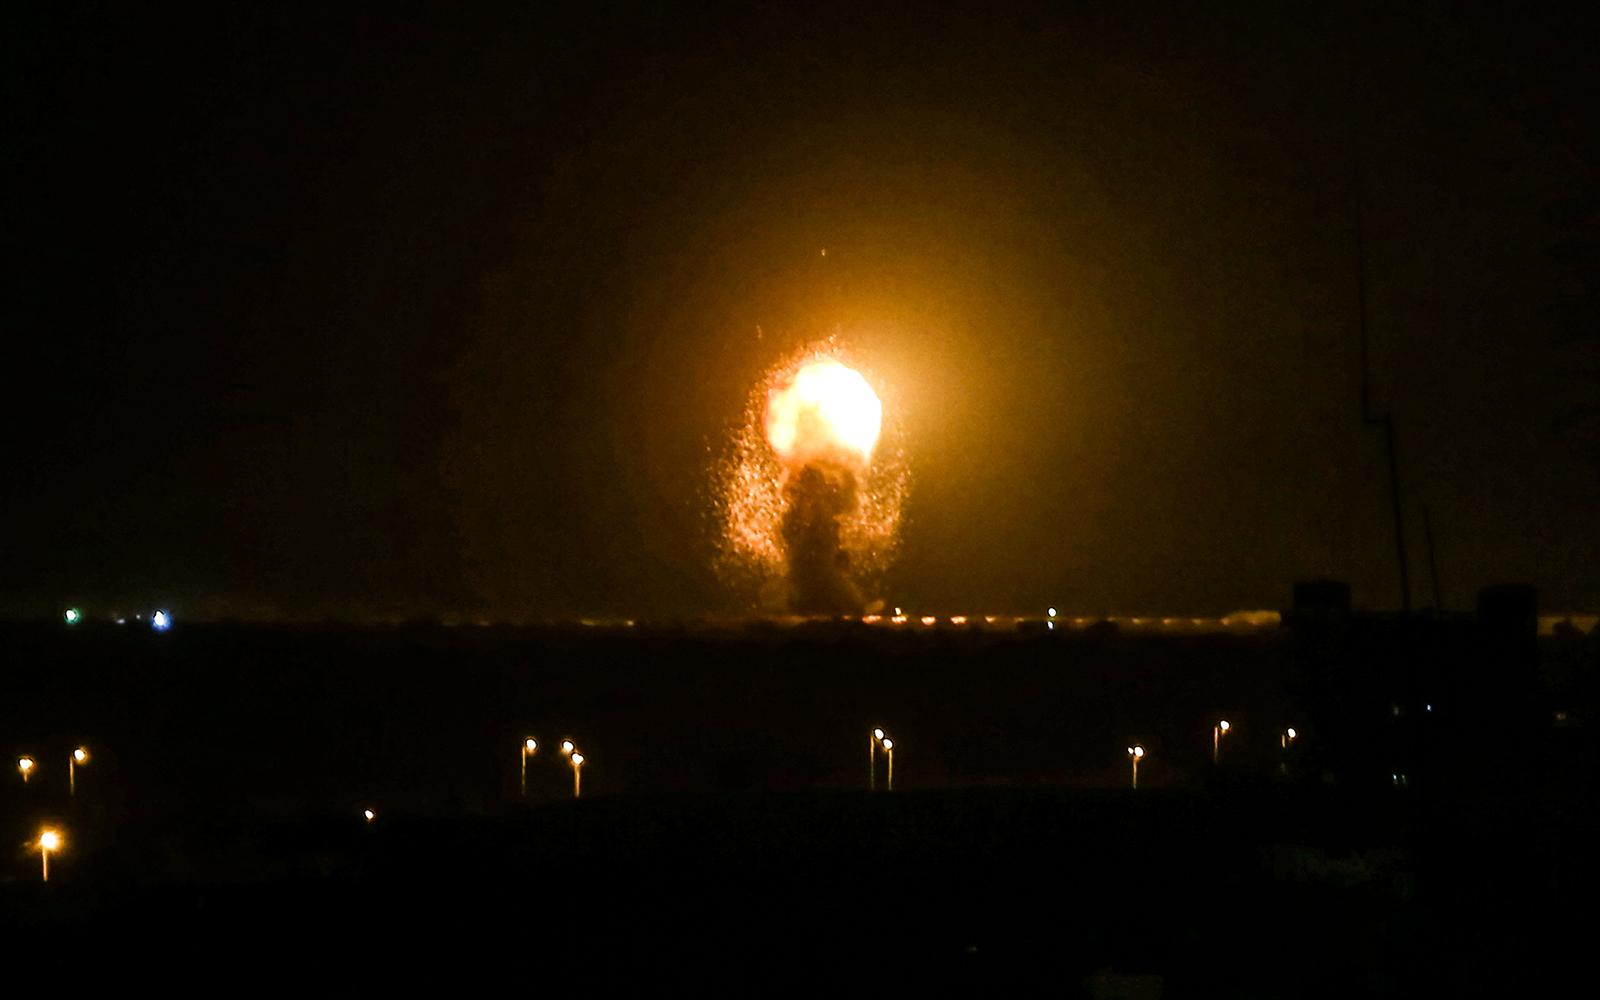 PALESTINE: Israel Launches Airstrikes Against Gaza